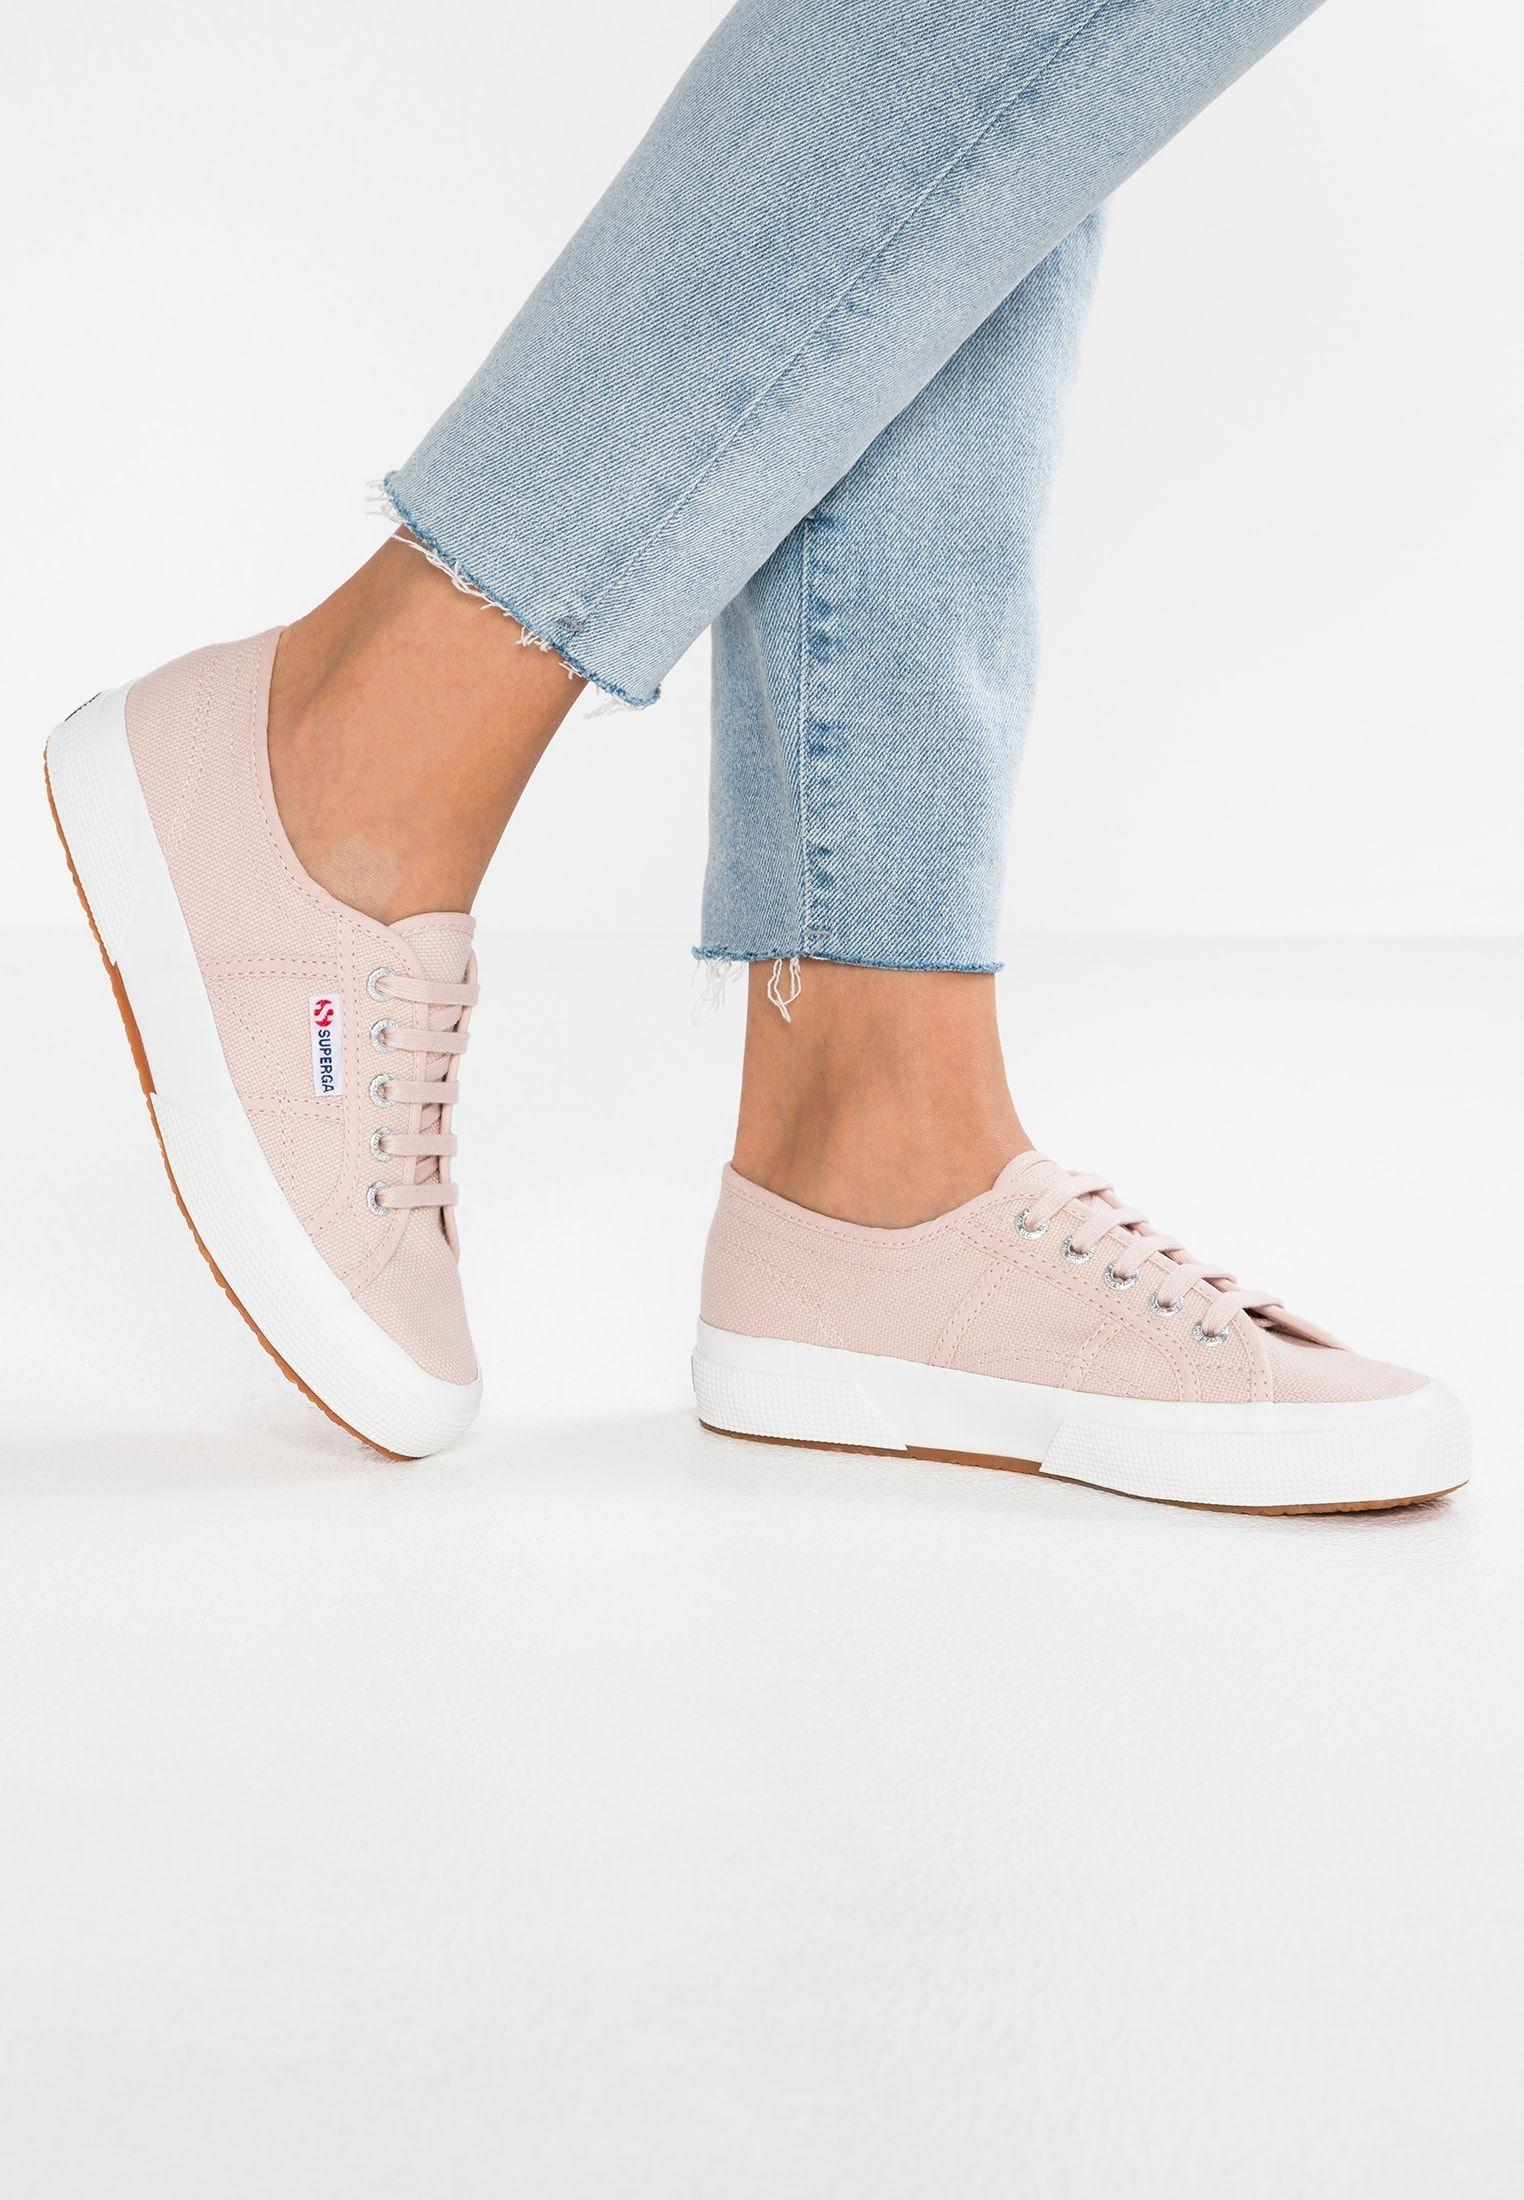 Geschäft Sportschuhe stabile Qualität 2750 CLASSIC - Sneakers basse - pink skin @ Zalando.it 🛒 in ...